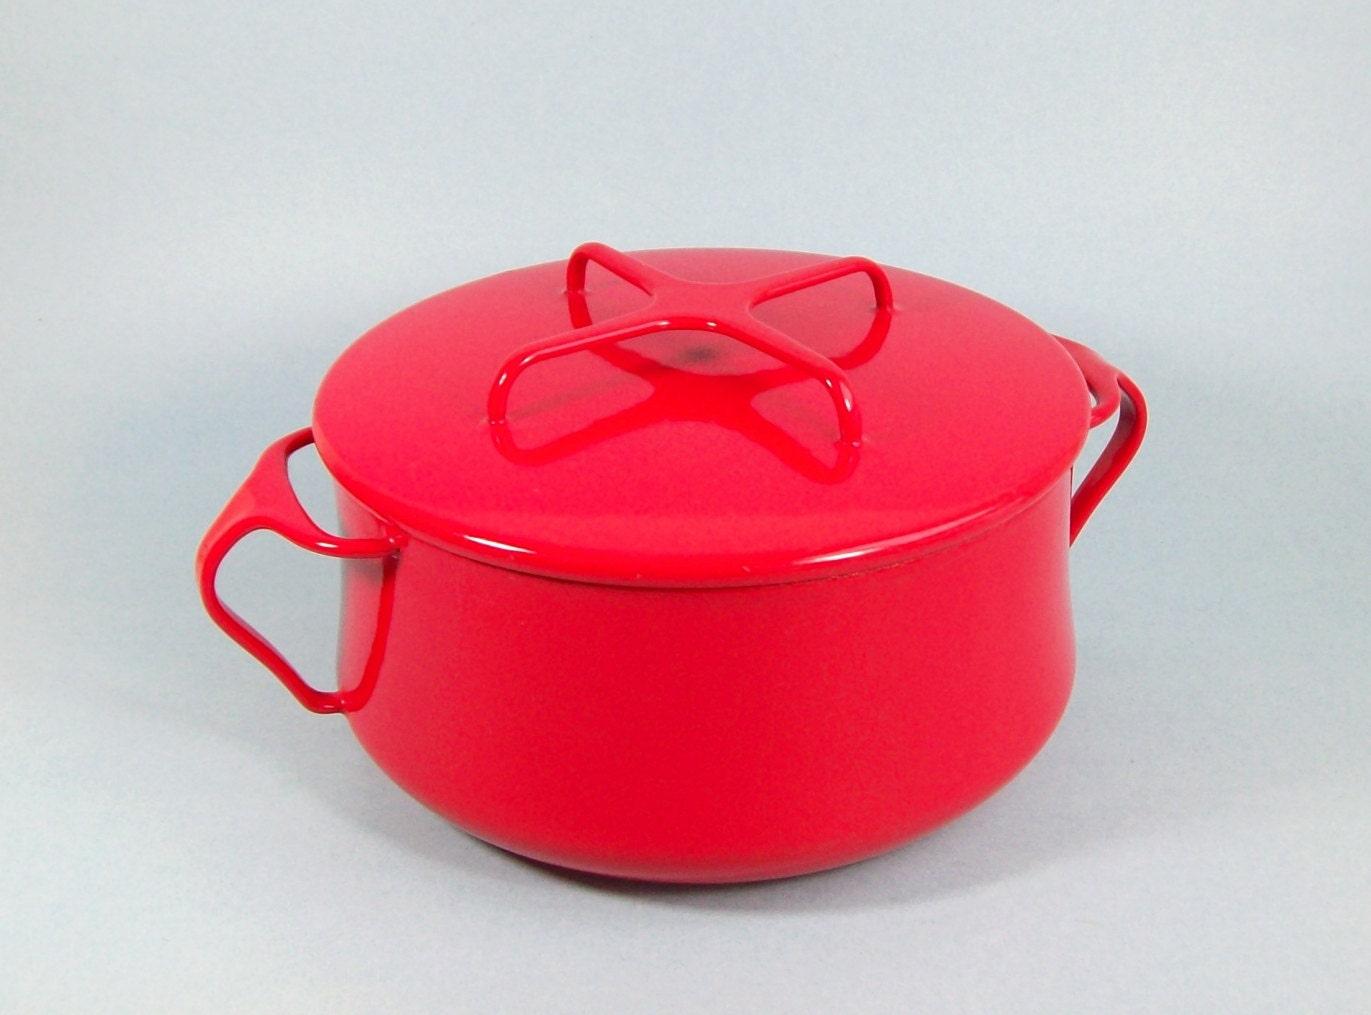 Vintage Dansk Kobenstyle Red Casserole Dutch Oven Pot - 2 Qt - Iconic Jens Quistgaard Design - Mid Century Danish Modern